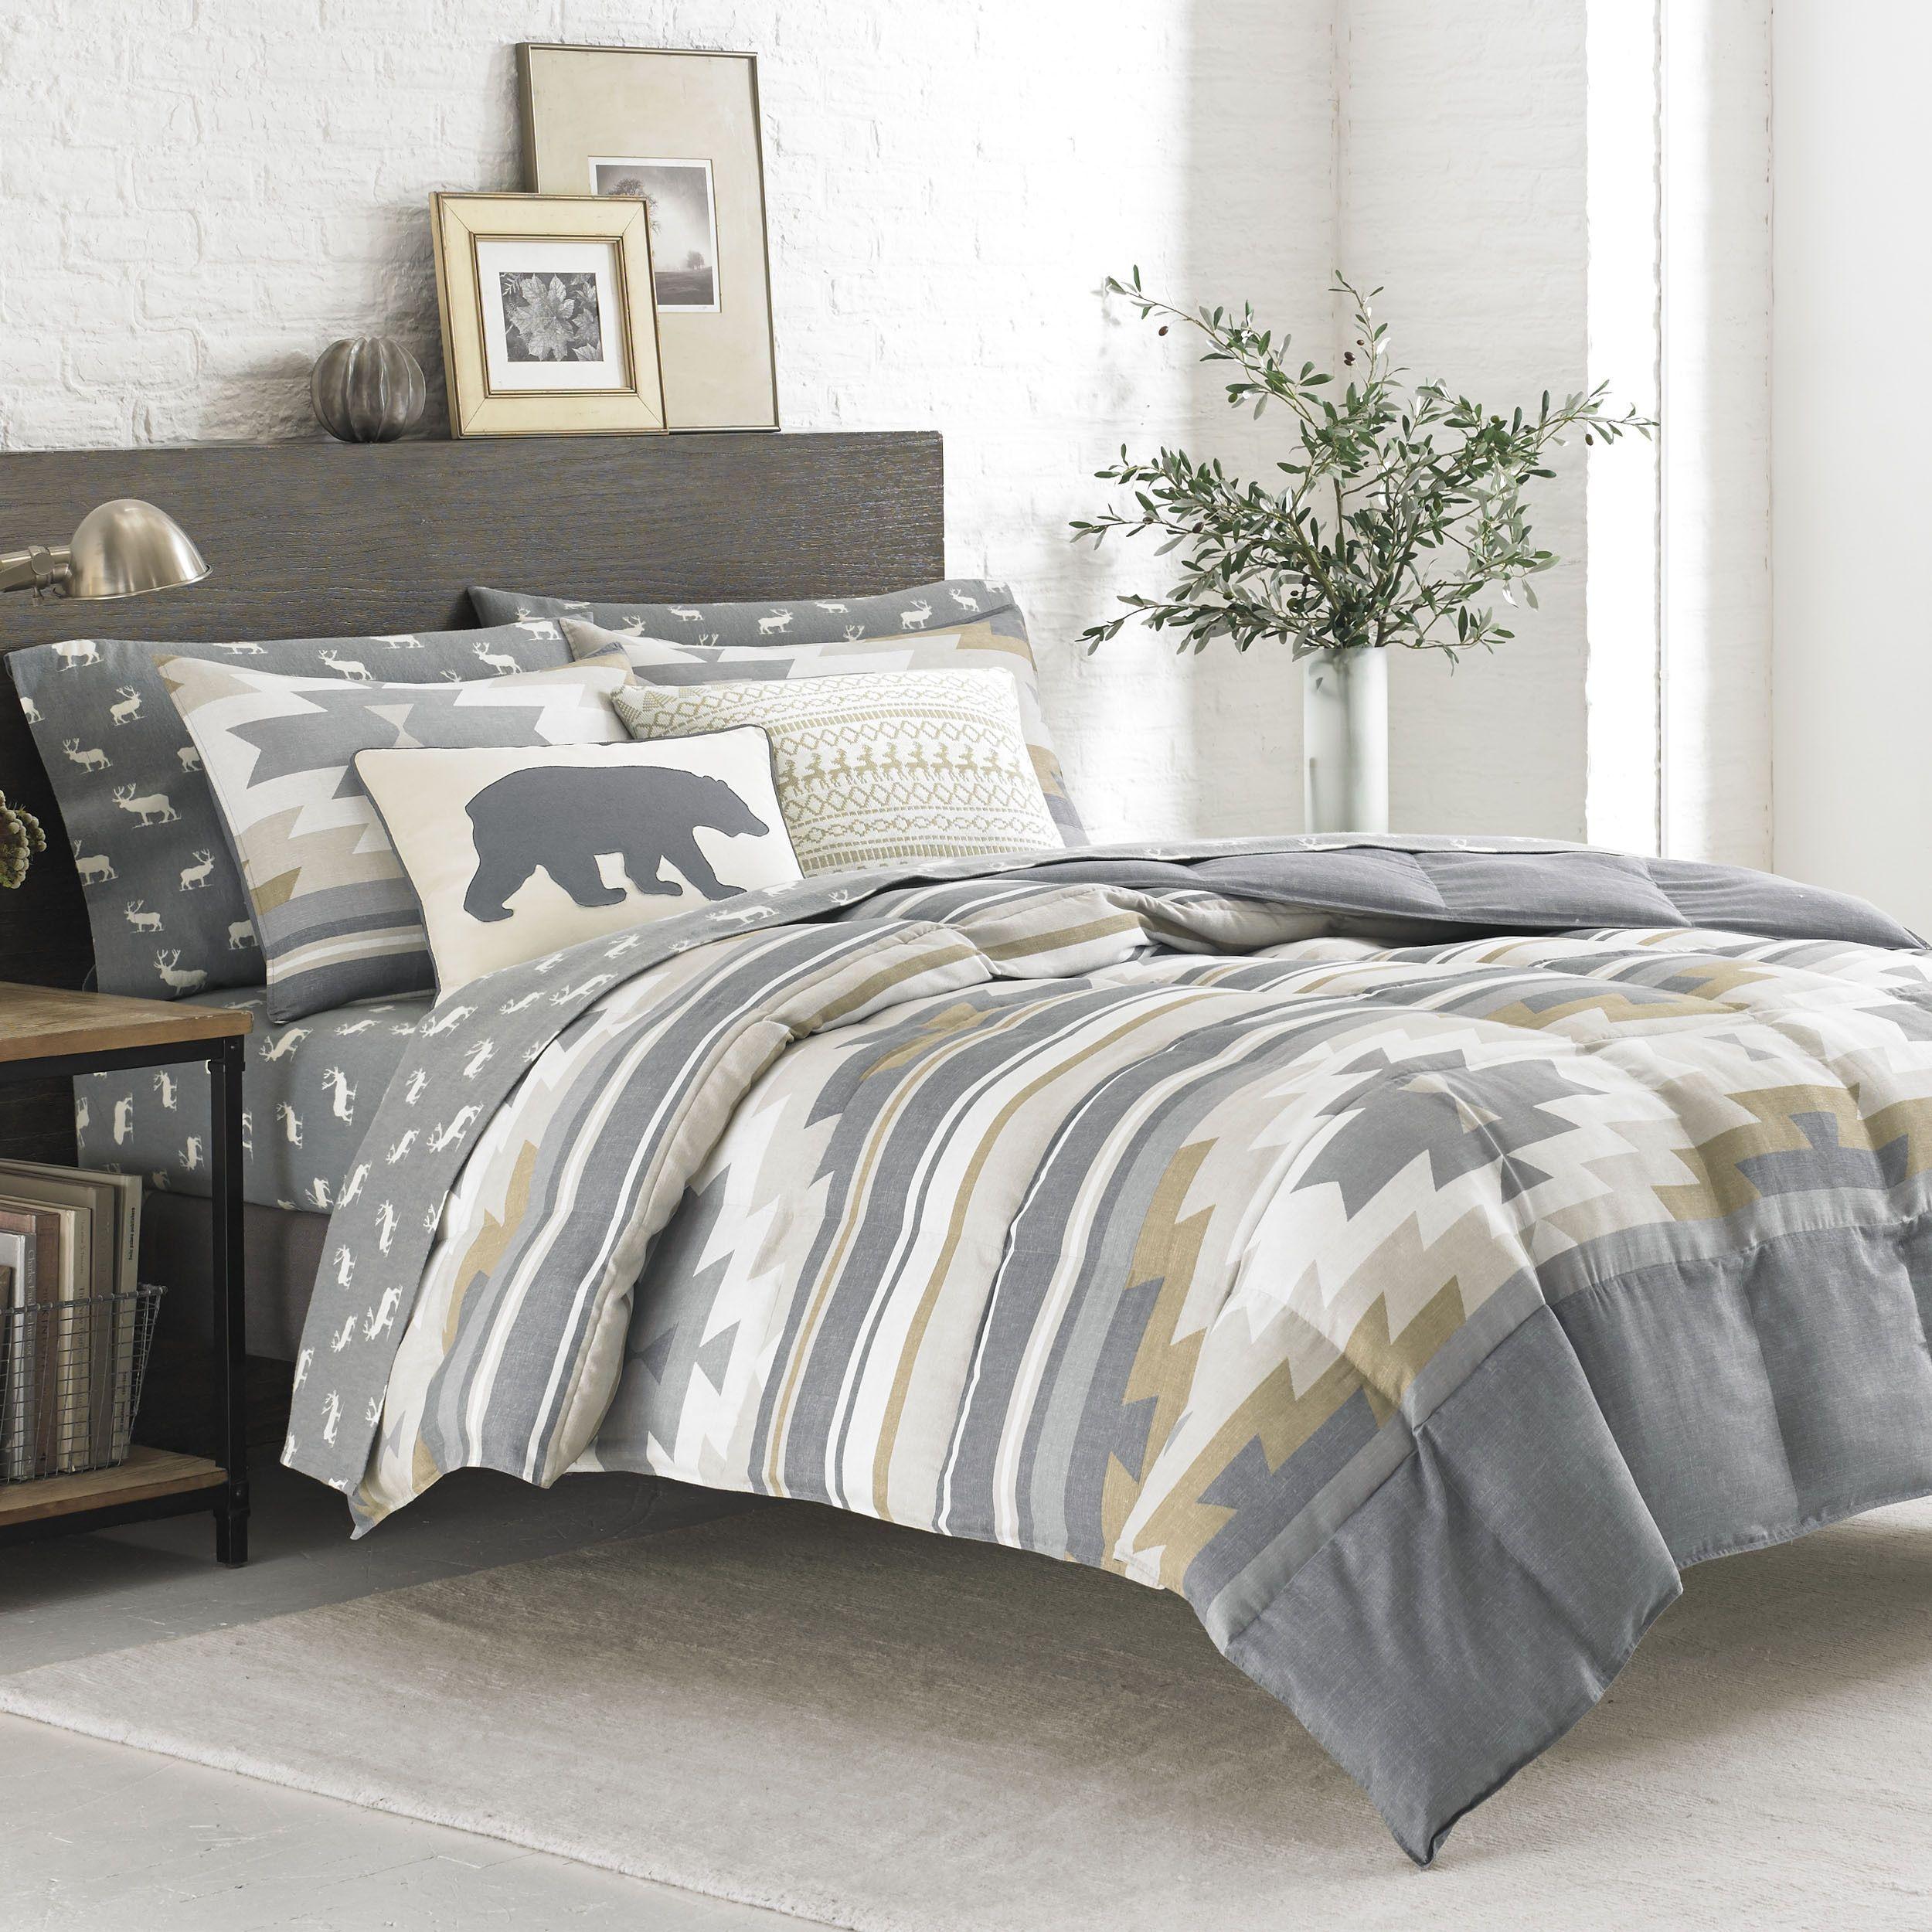 greyfull comforter sets free shipping on orders over  bring  - greyfull comforter sets free shipping on orders over  bring thecomfort